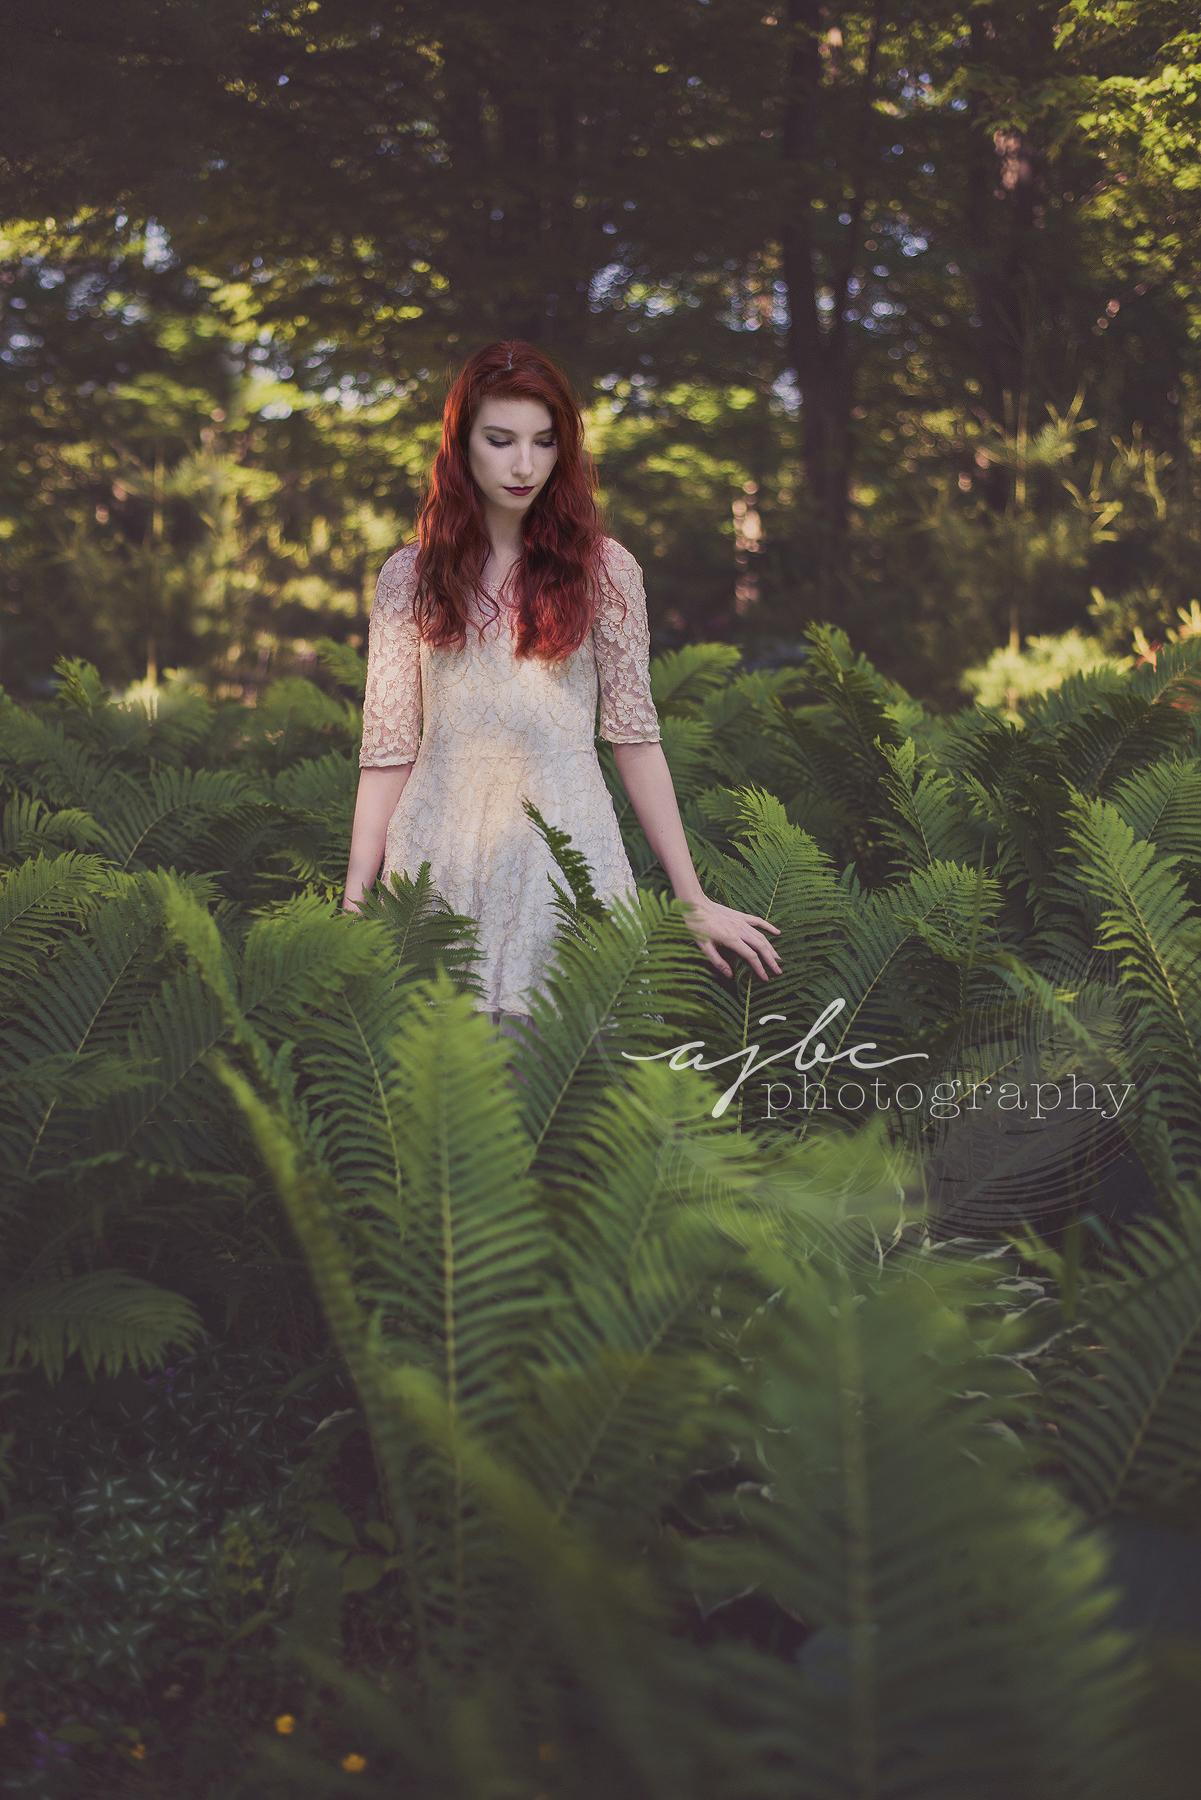 AJBC Photography Fine Art Port Huron Beauty Photographer outdoors ferns.jpg